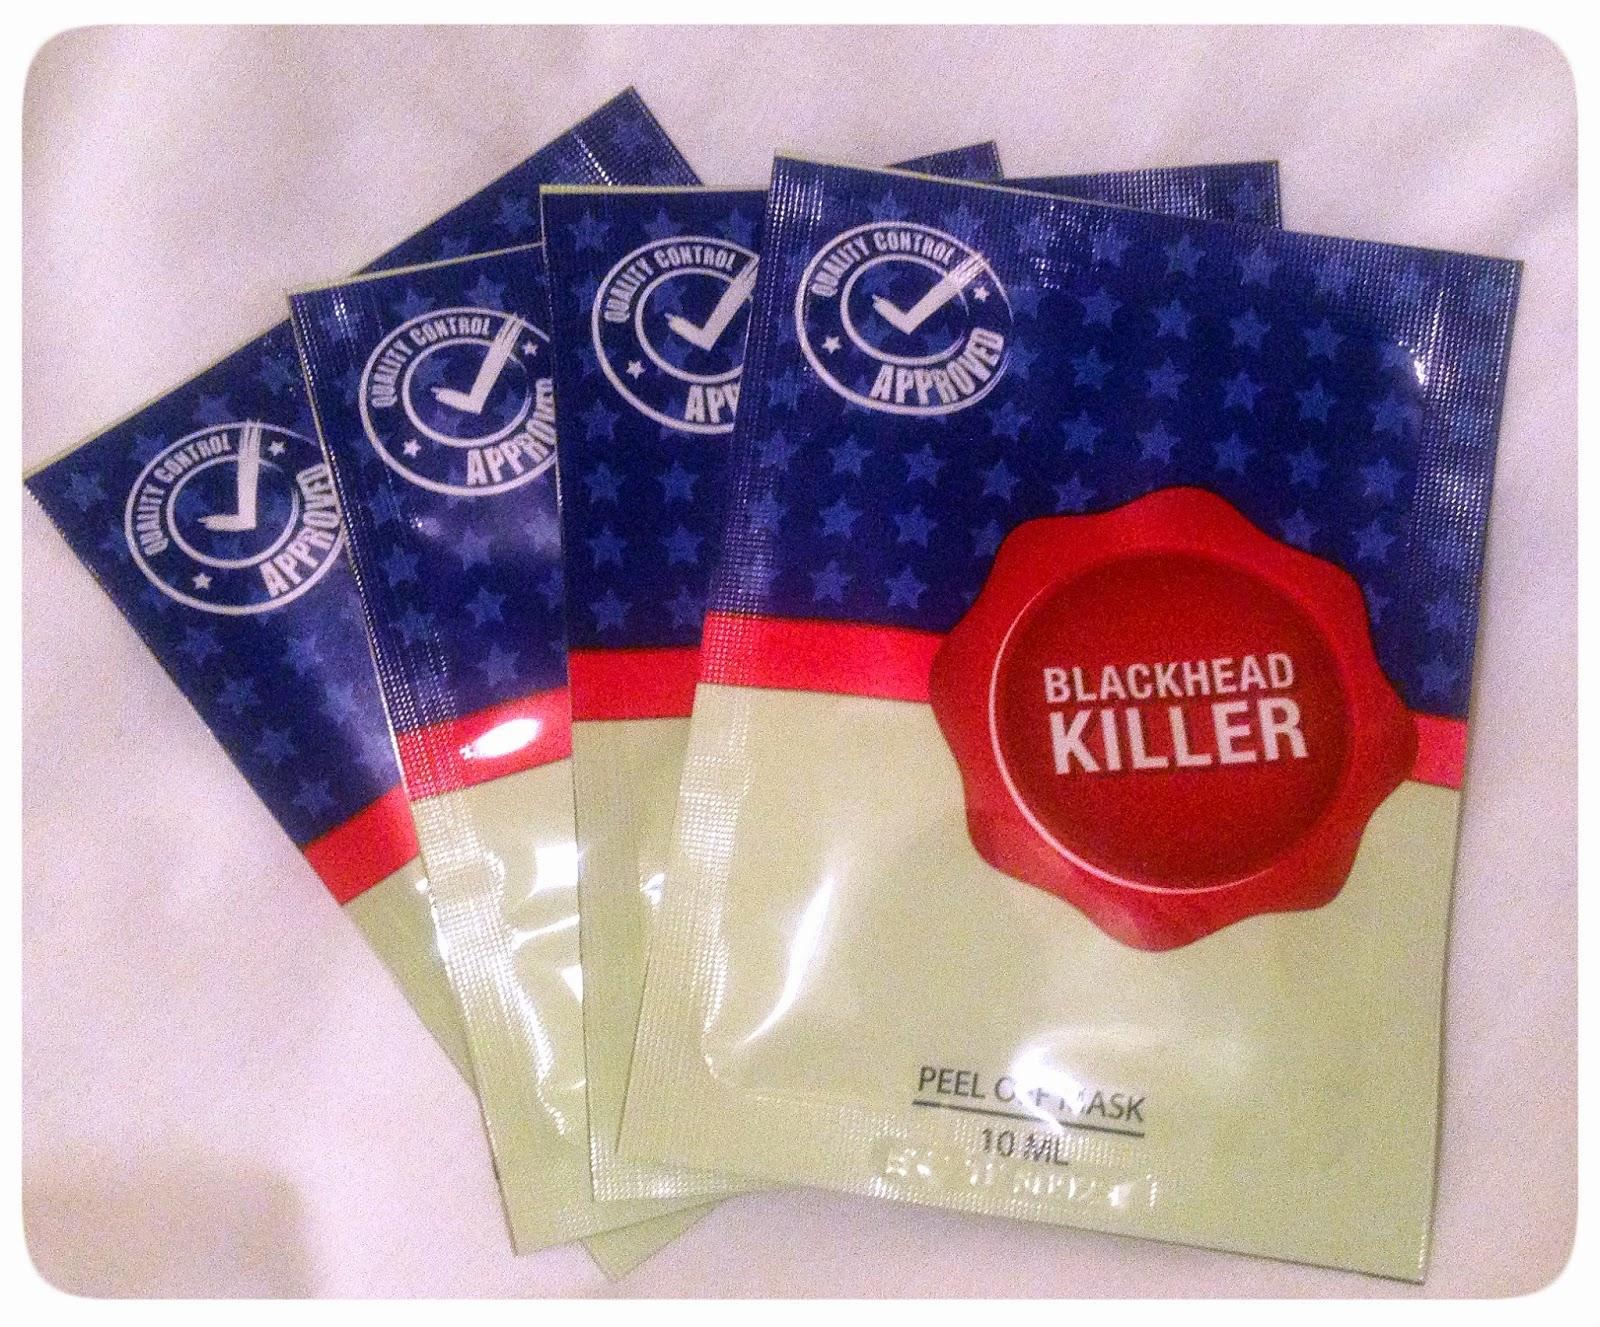 Blackhead Killer peel off mask: Review